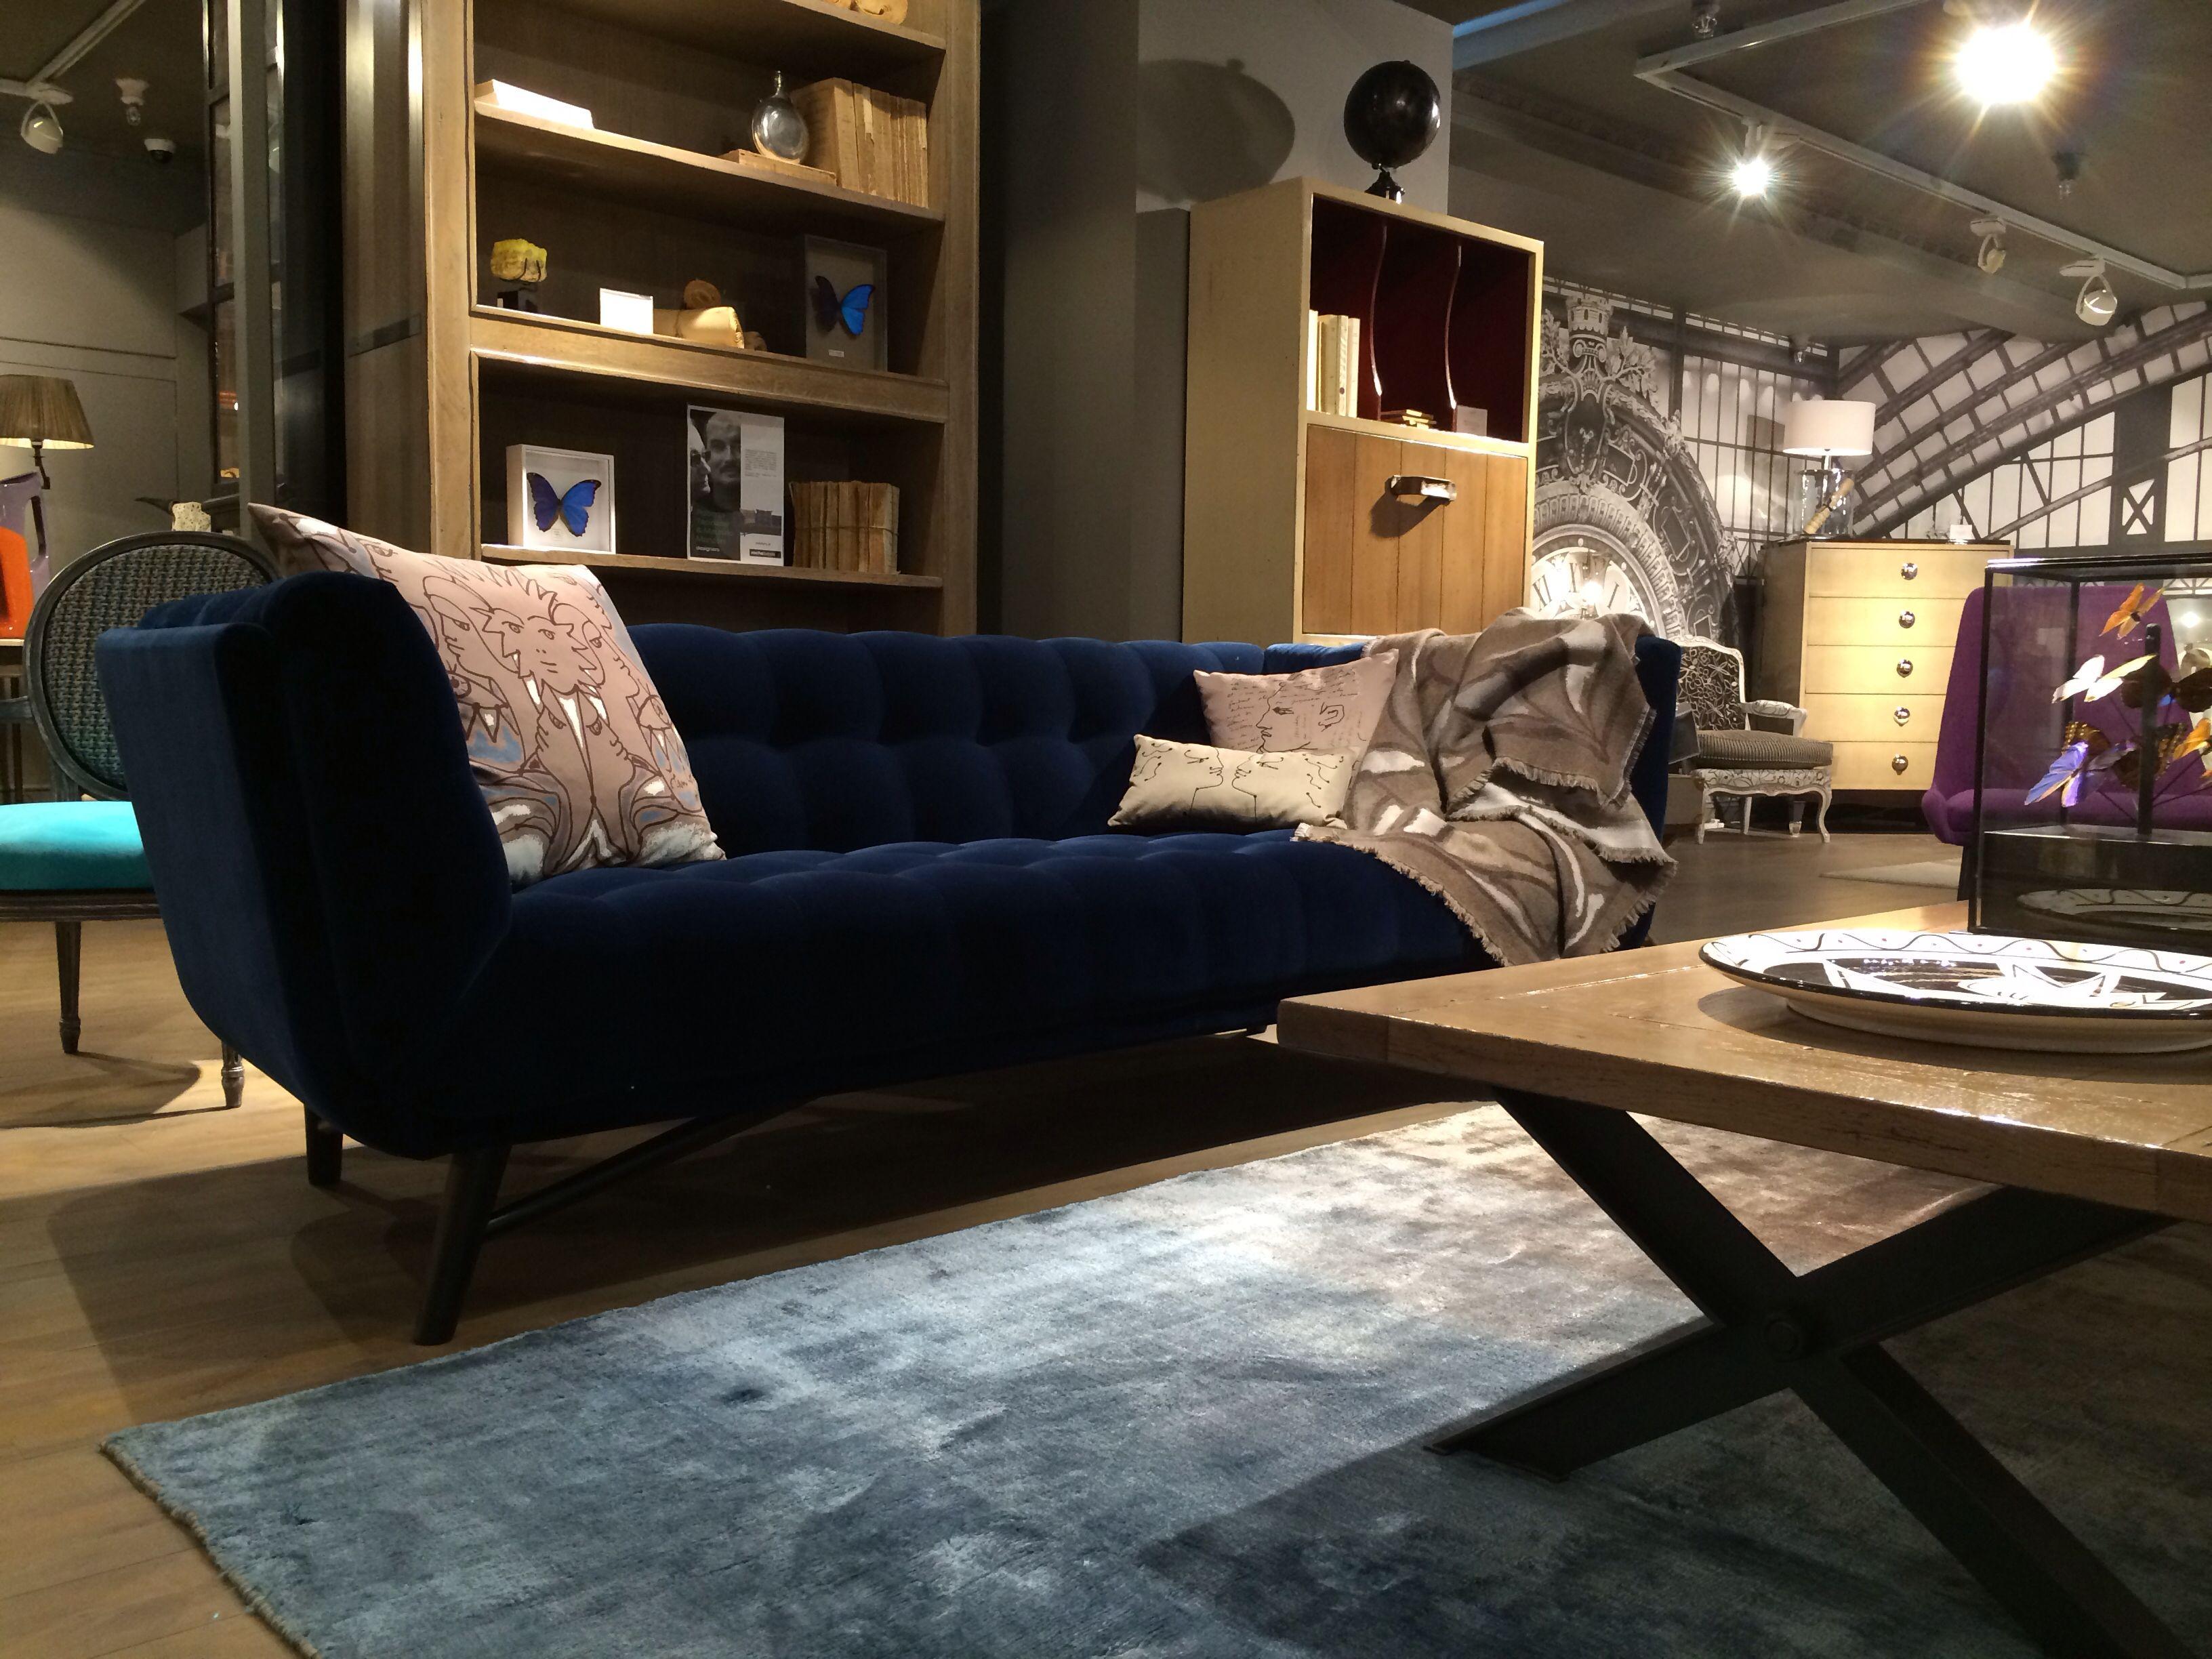 blue velvet sofa living room ideas memory foam bed mattress pad roche bobois interior design